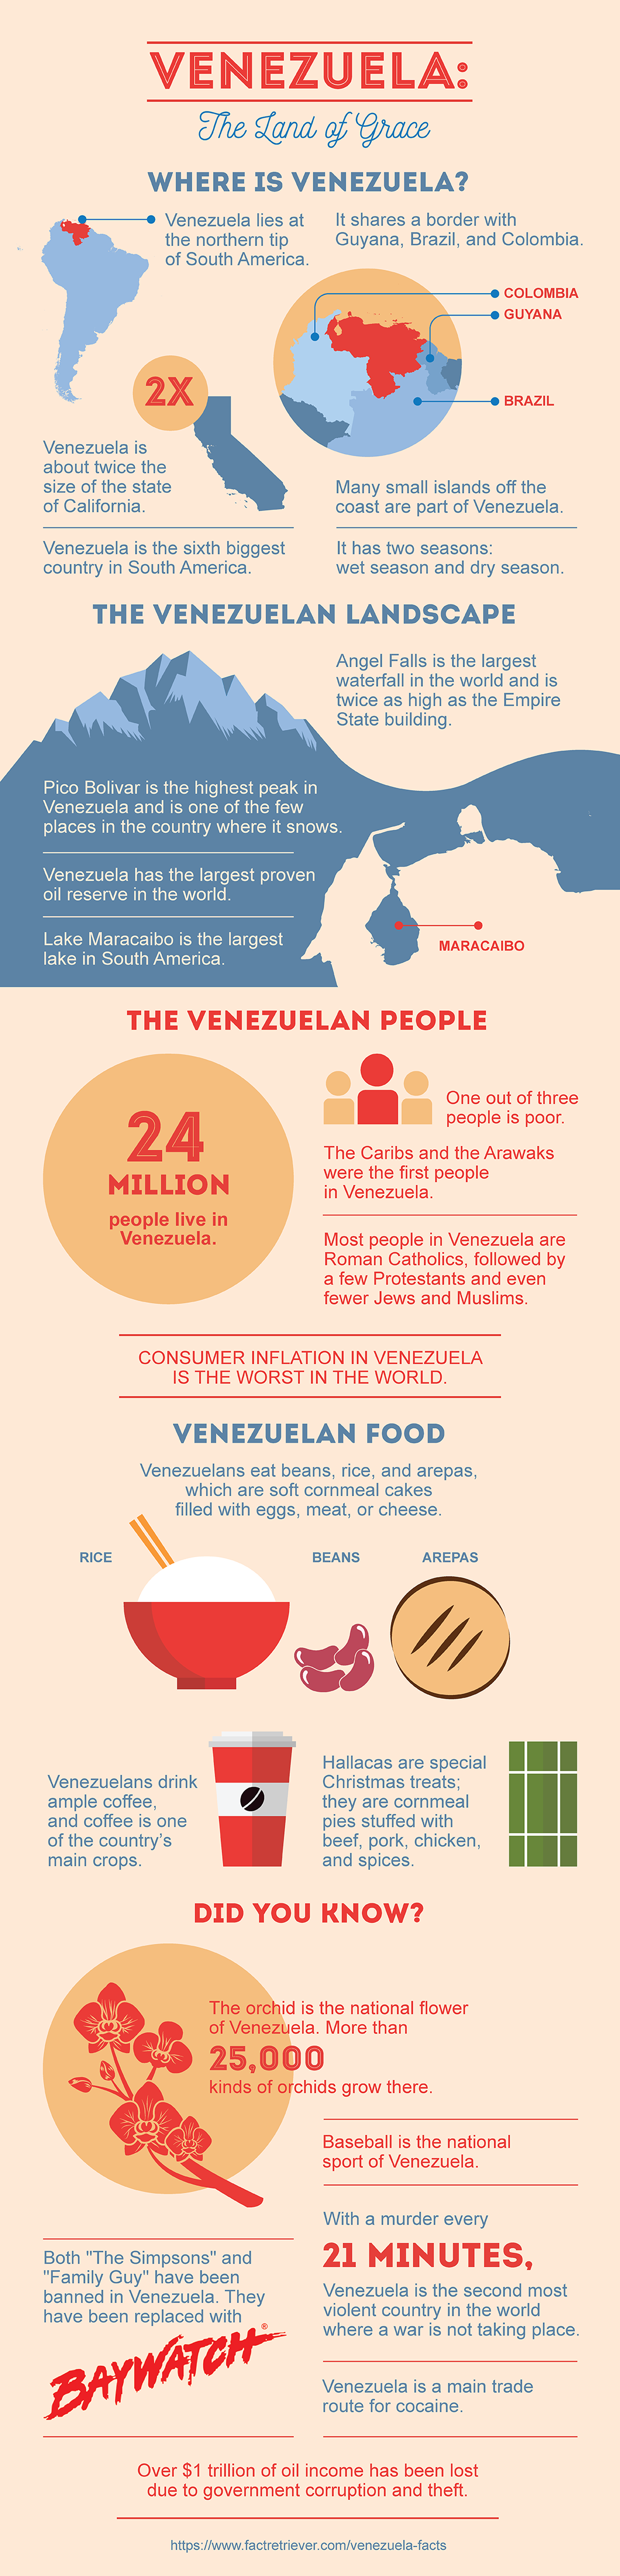 35 Interesting Facts About Venezuela